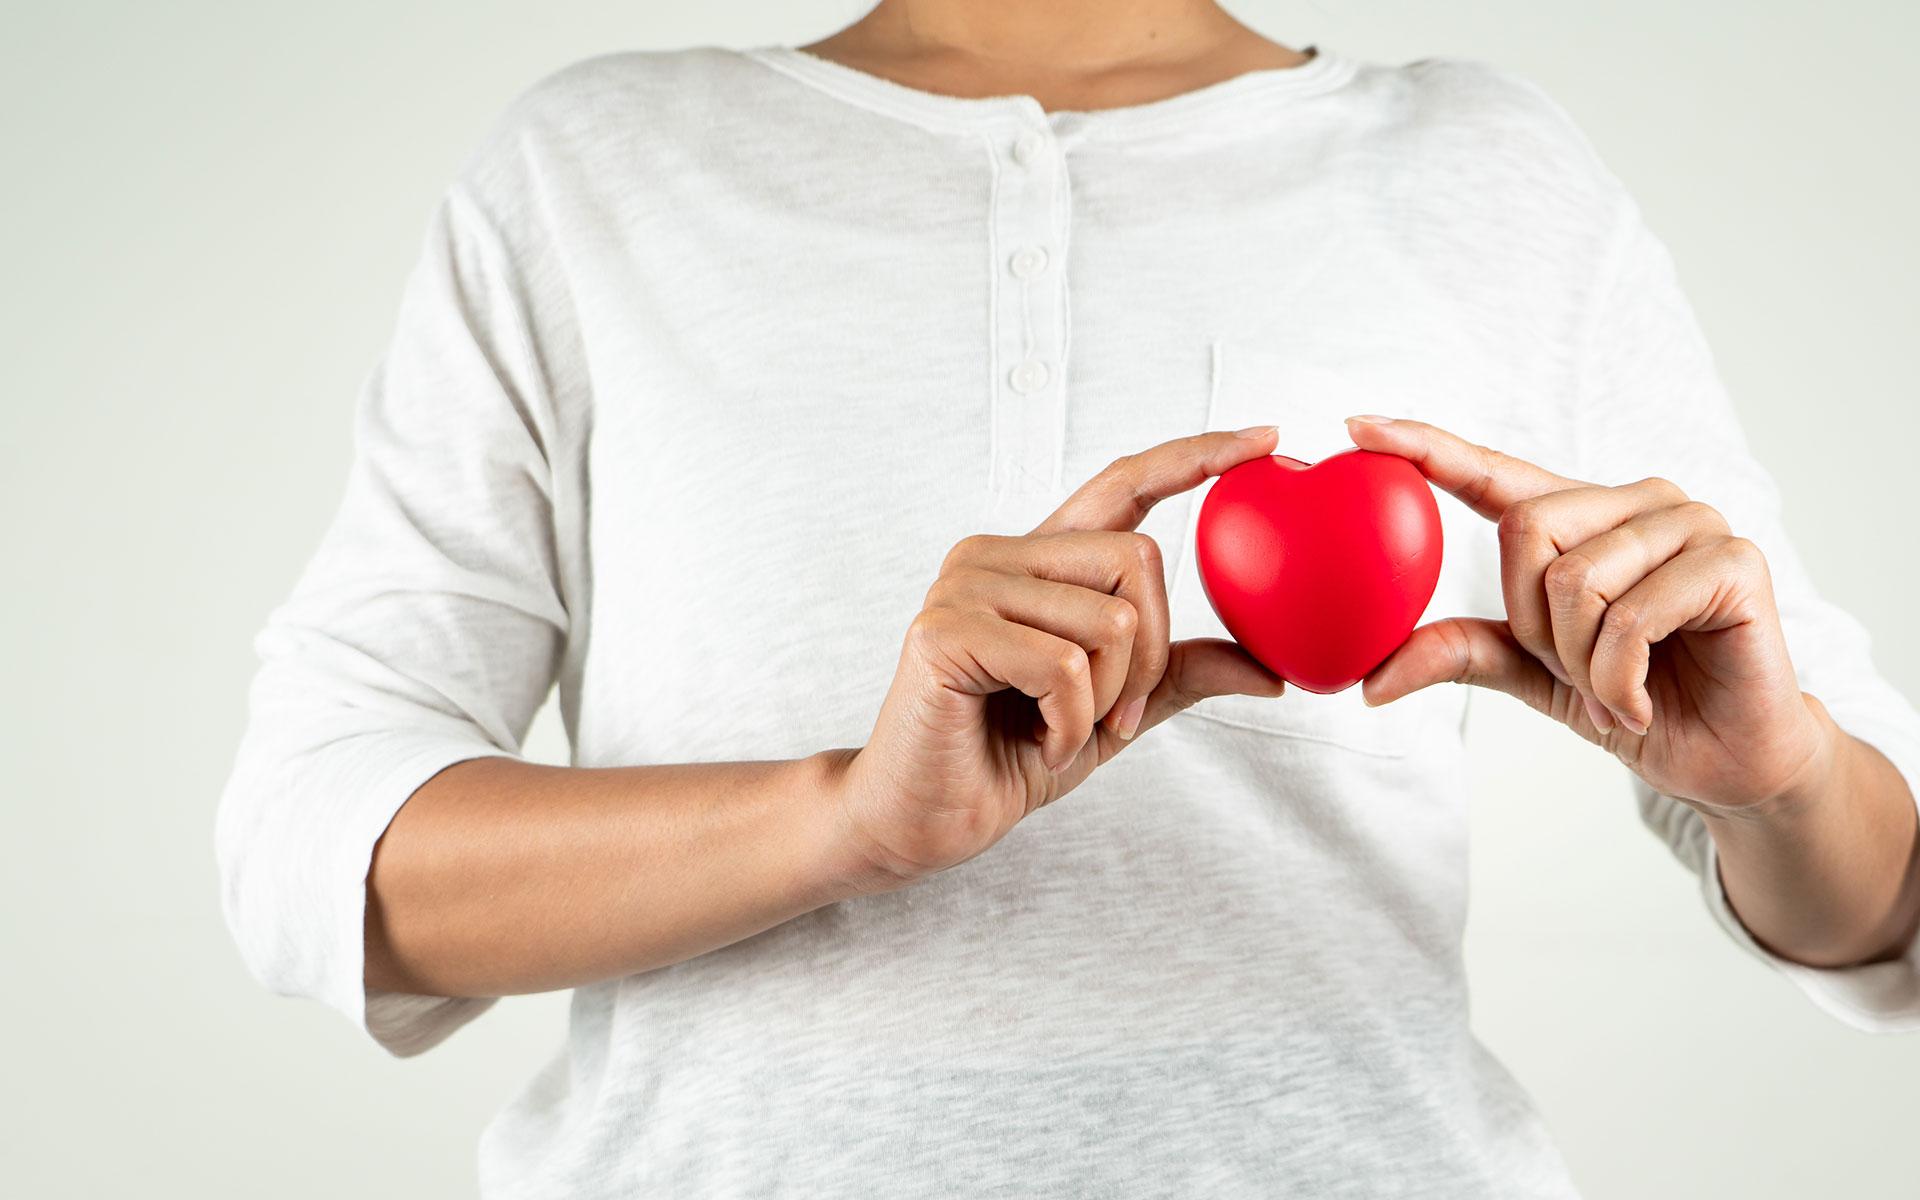 Forsythia Suspensa as the heart stimulant